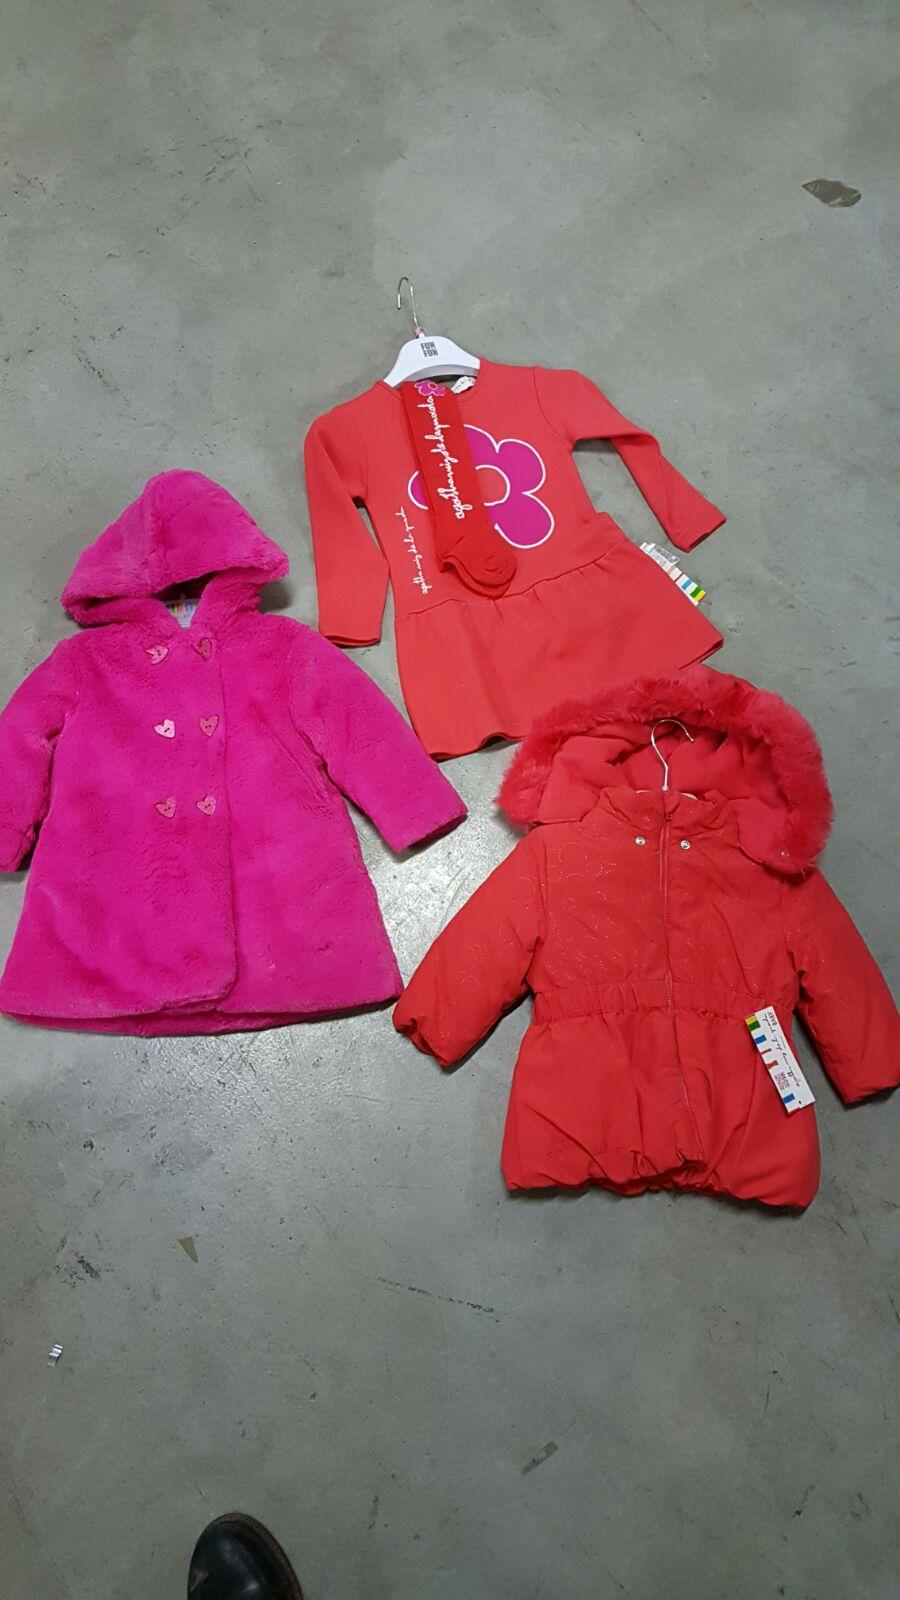 c5338ab747c1 Stocklot children branded clothing - Stock Italy Srl